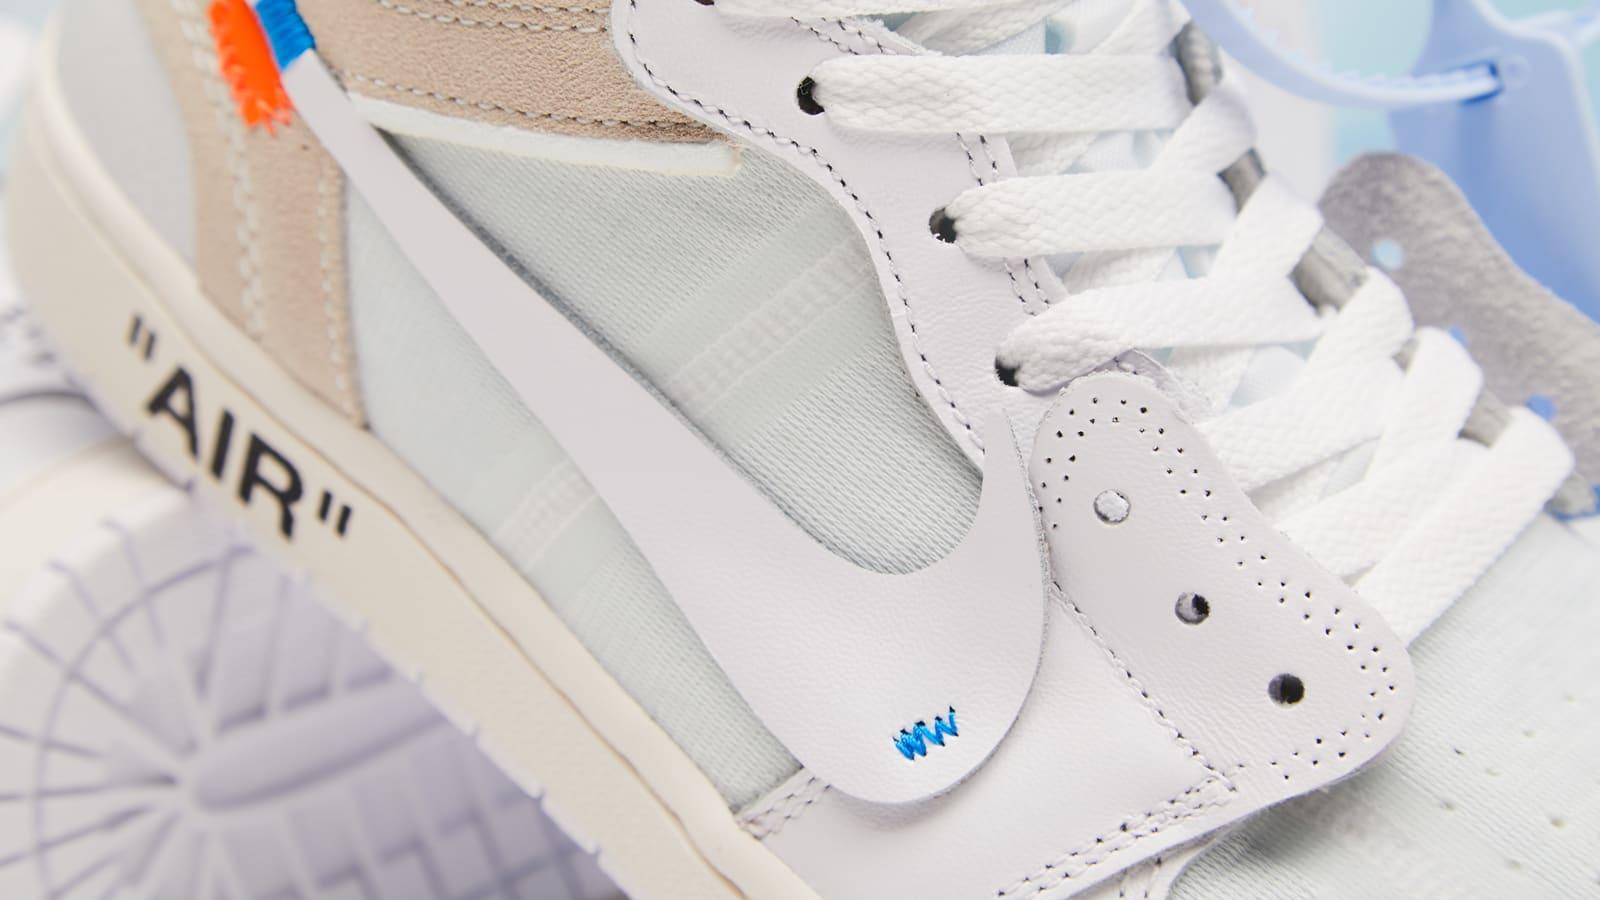 transferir Patriótico Artista  END. Features | Confirmed: Virgil Abloh x Nike Air Jordan 1